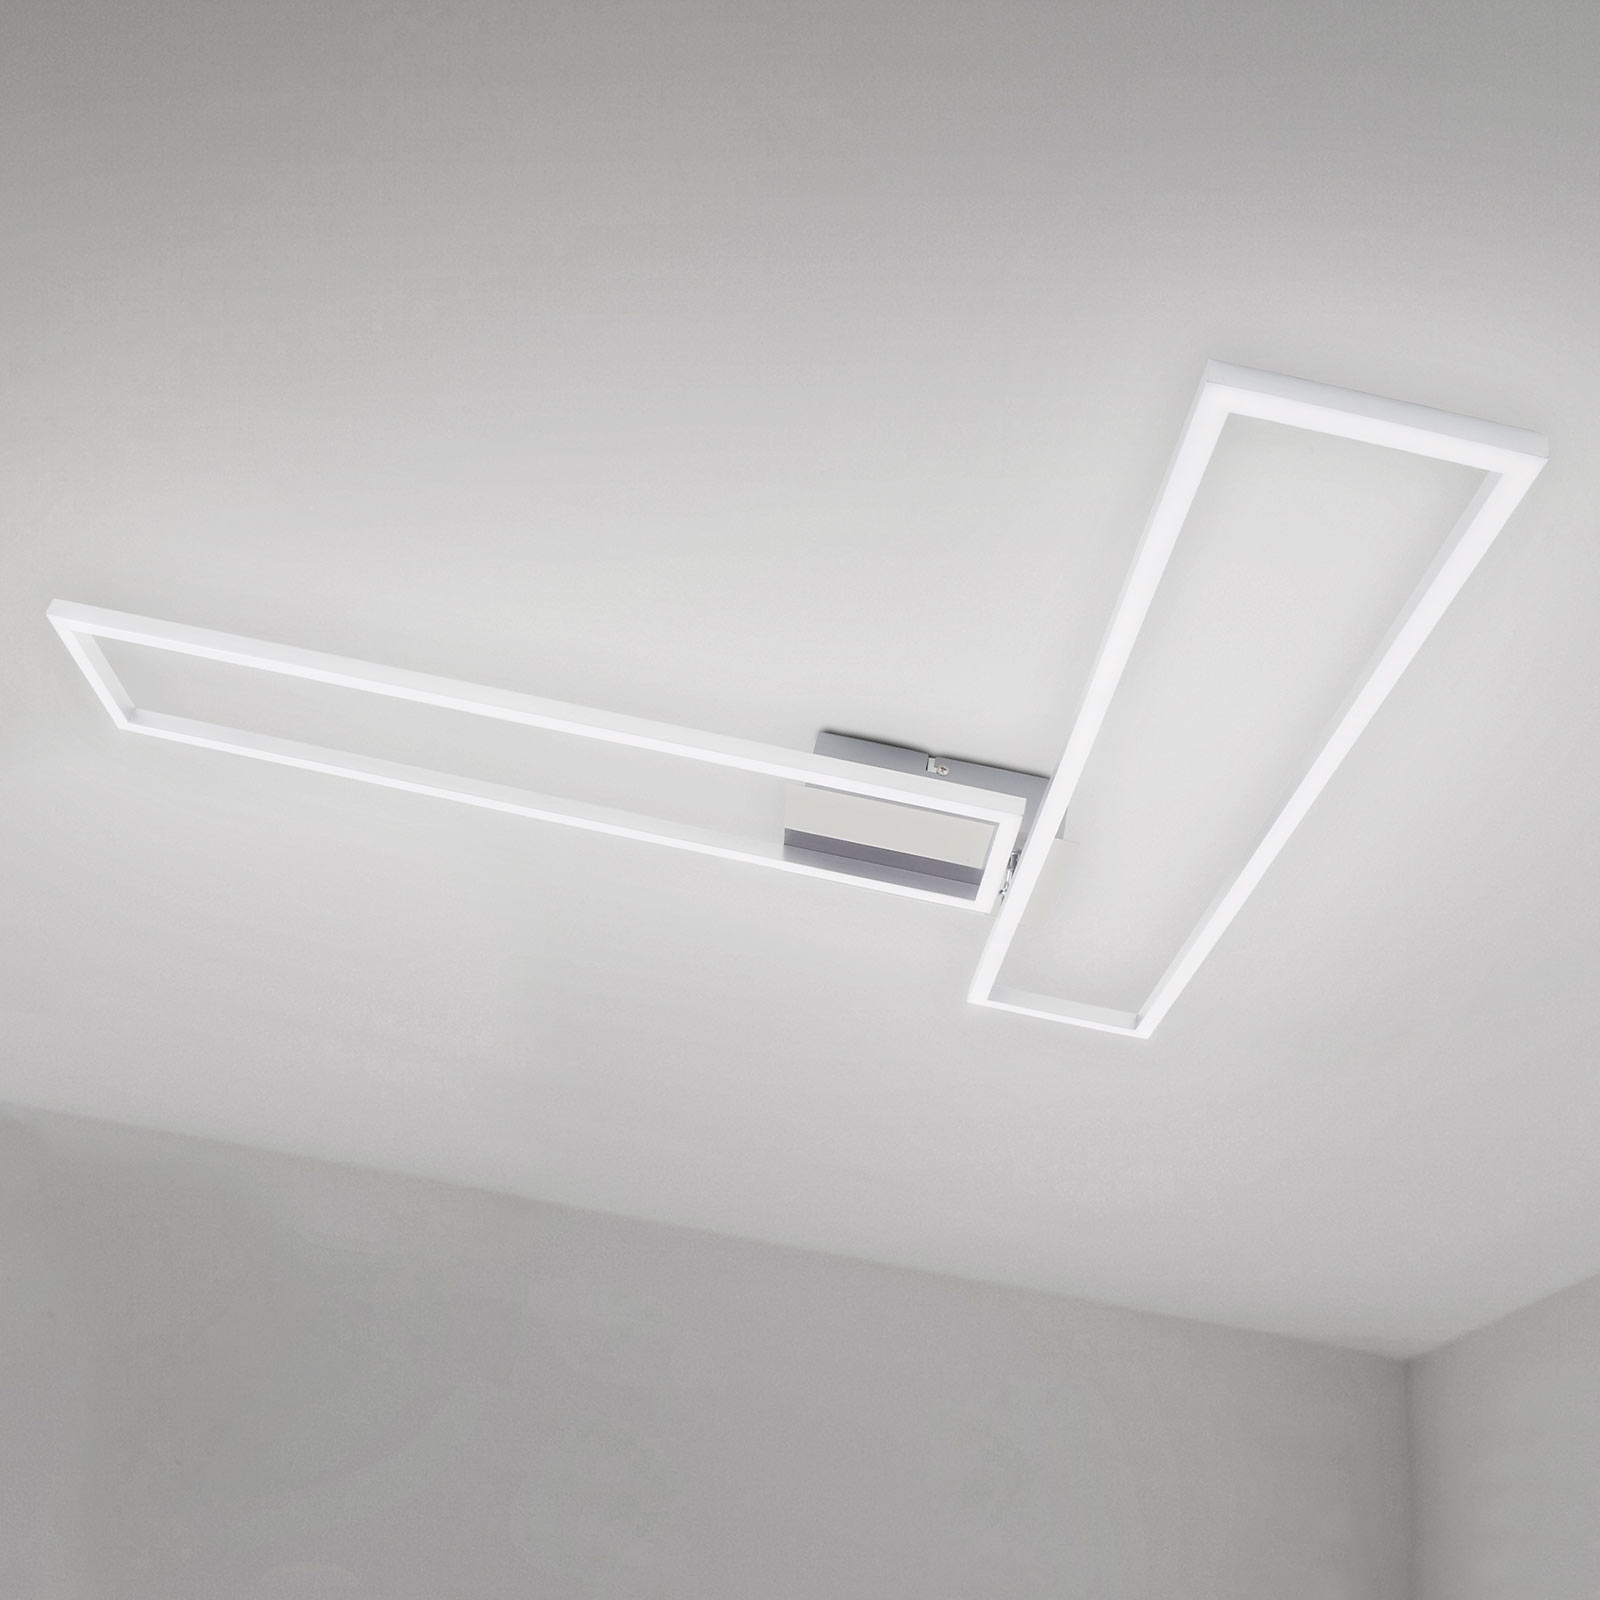 Plafondlamp Frame WiFi CCT, afstandsbediening, alu